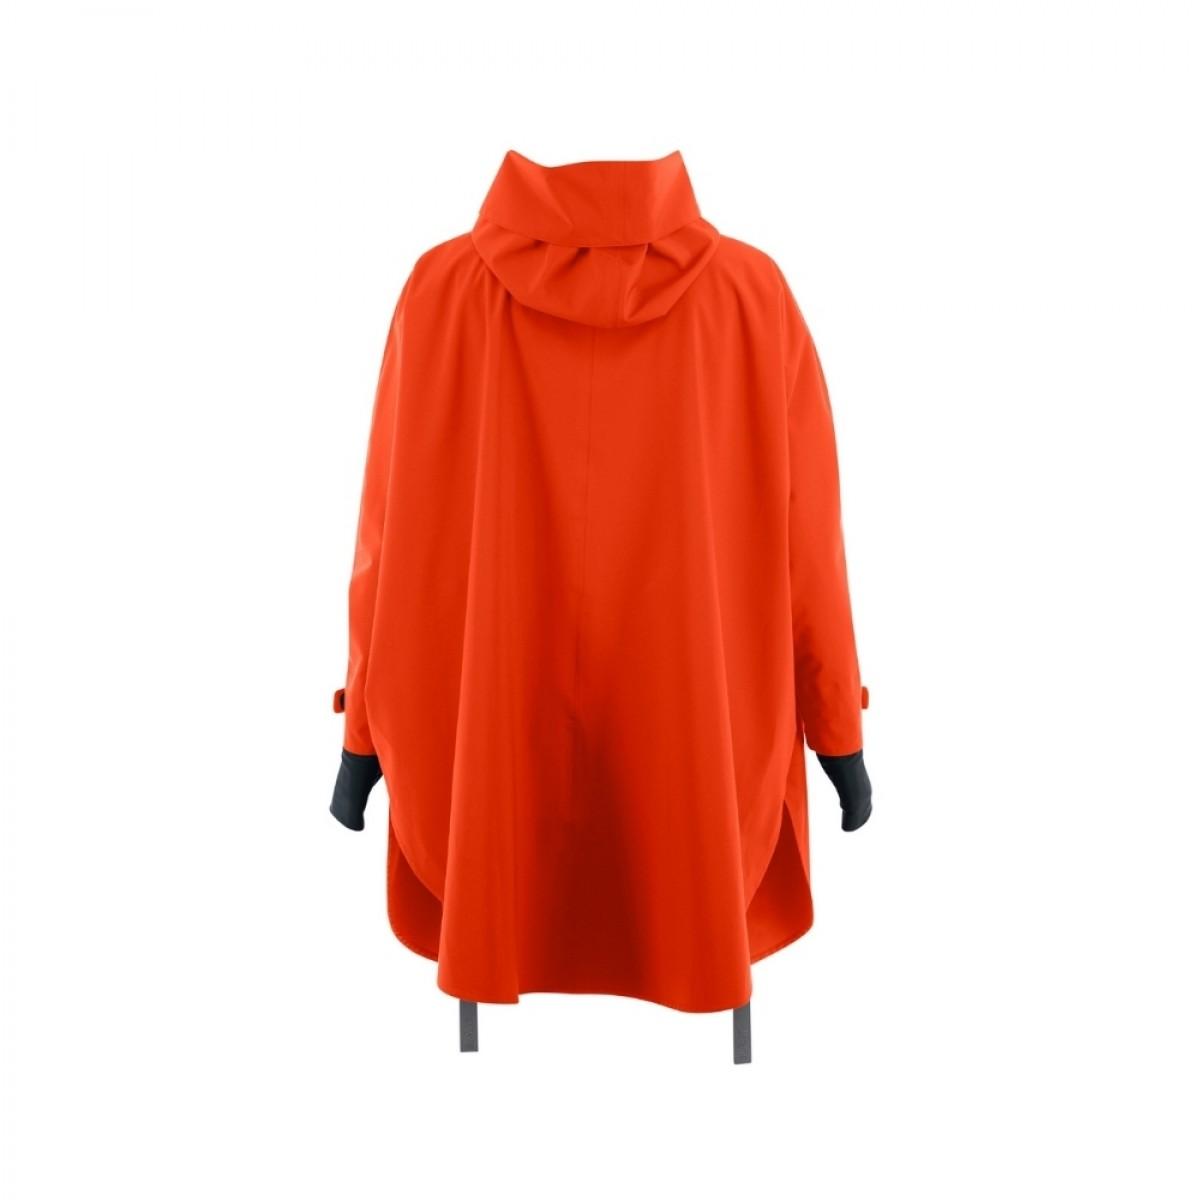 bergen regn poncho orange - bag